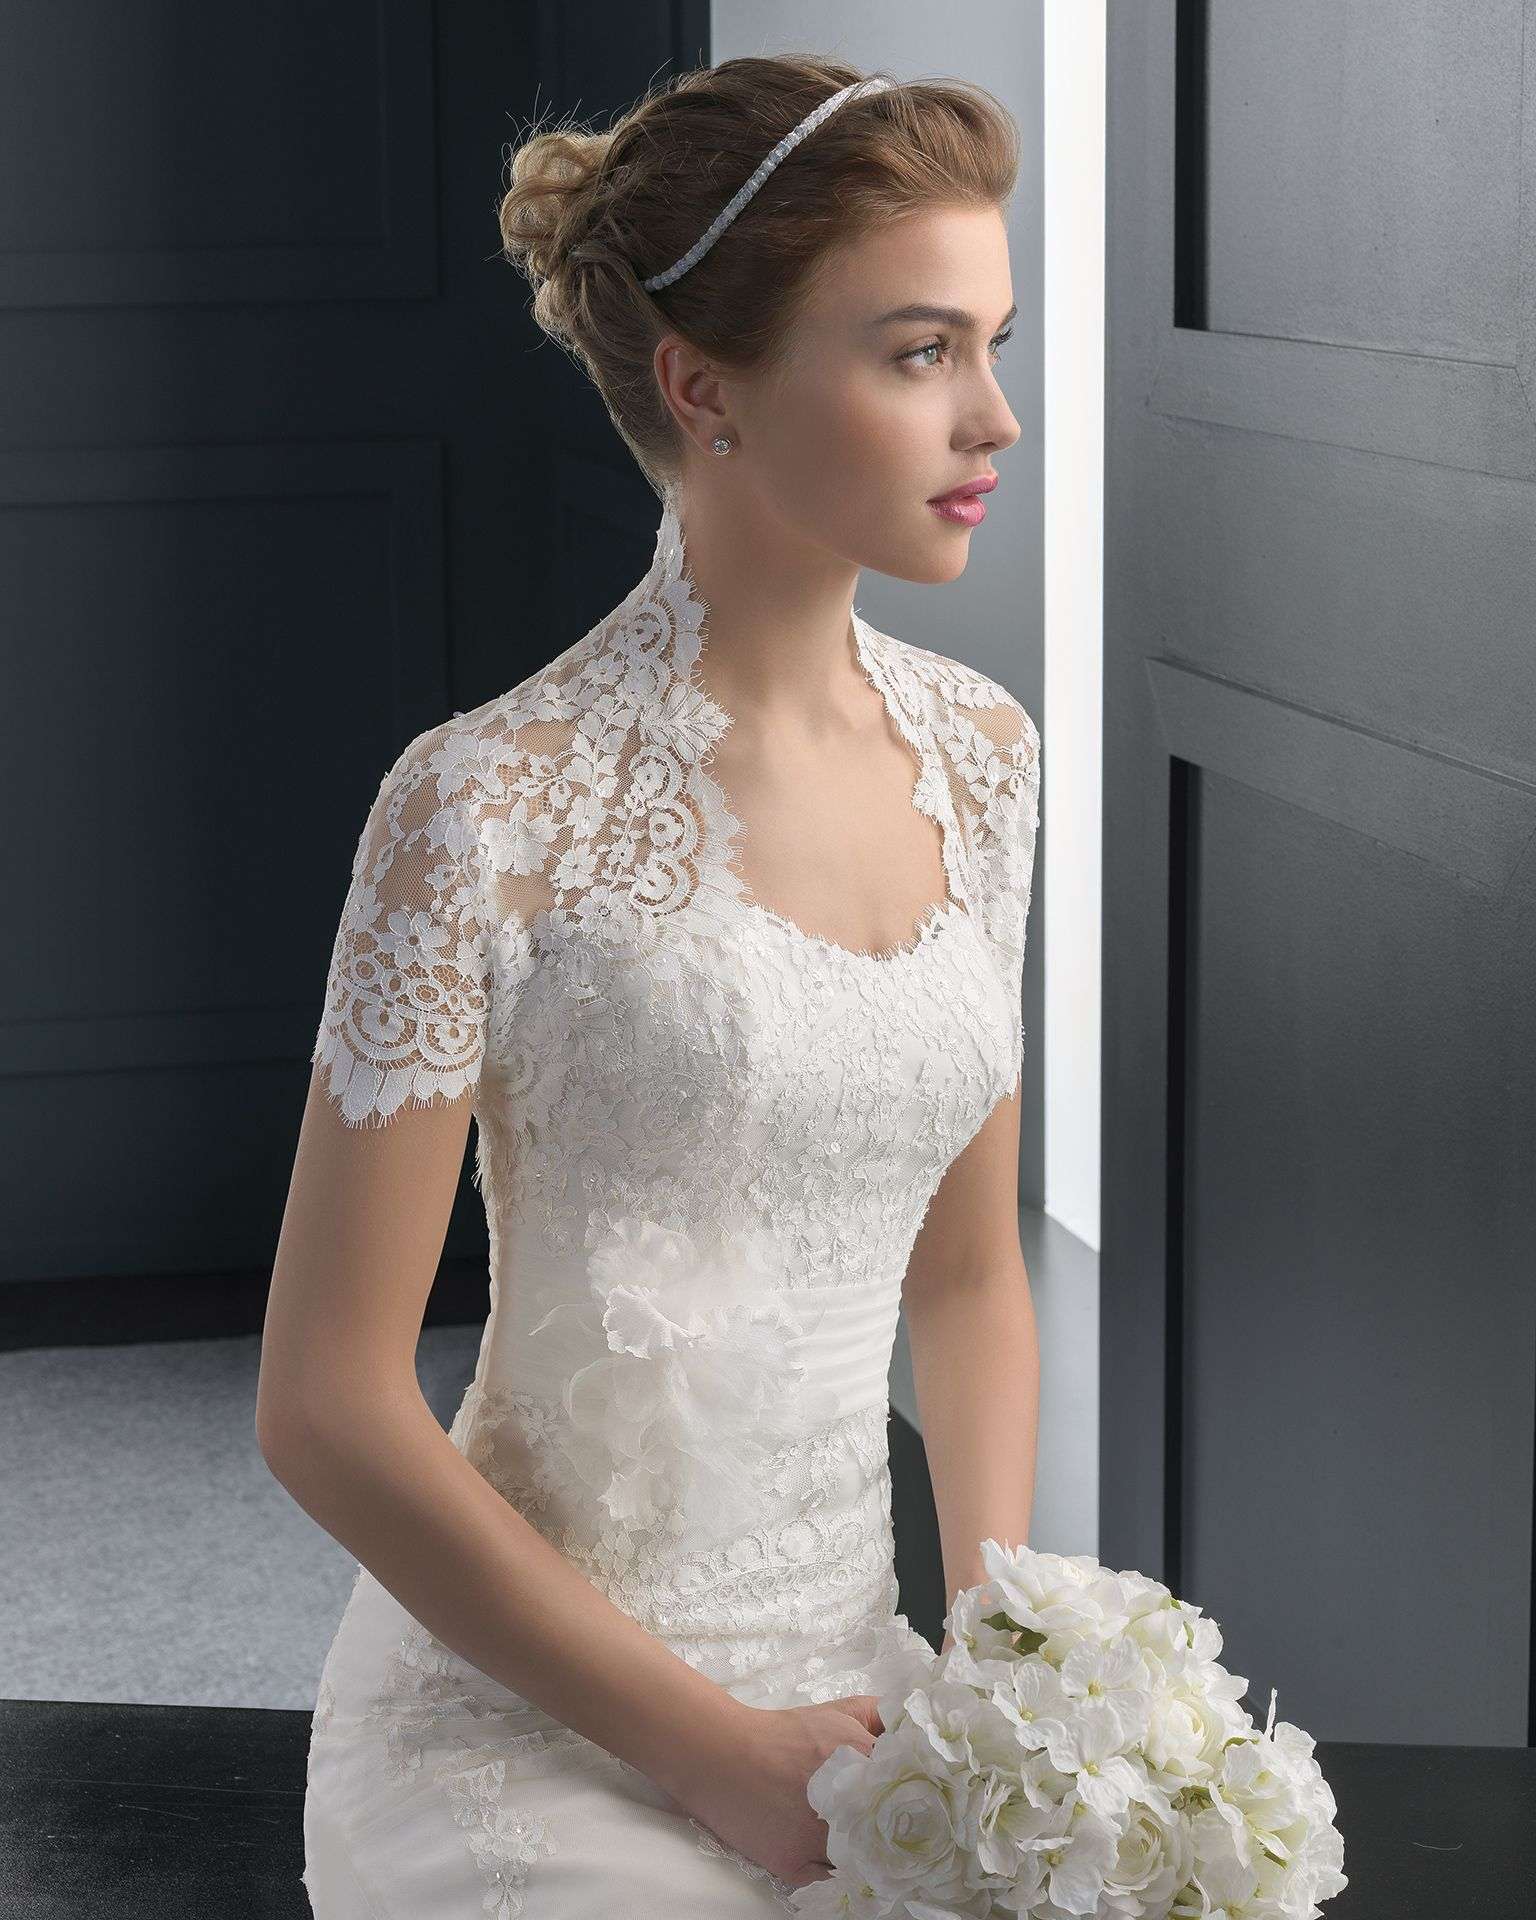 Rania novia corte sirena   Hochzeit Outfit   Pinterest   Traum ...